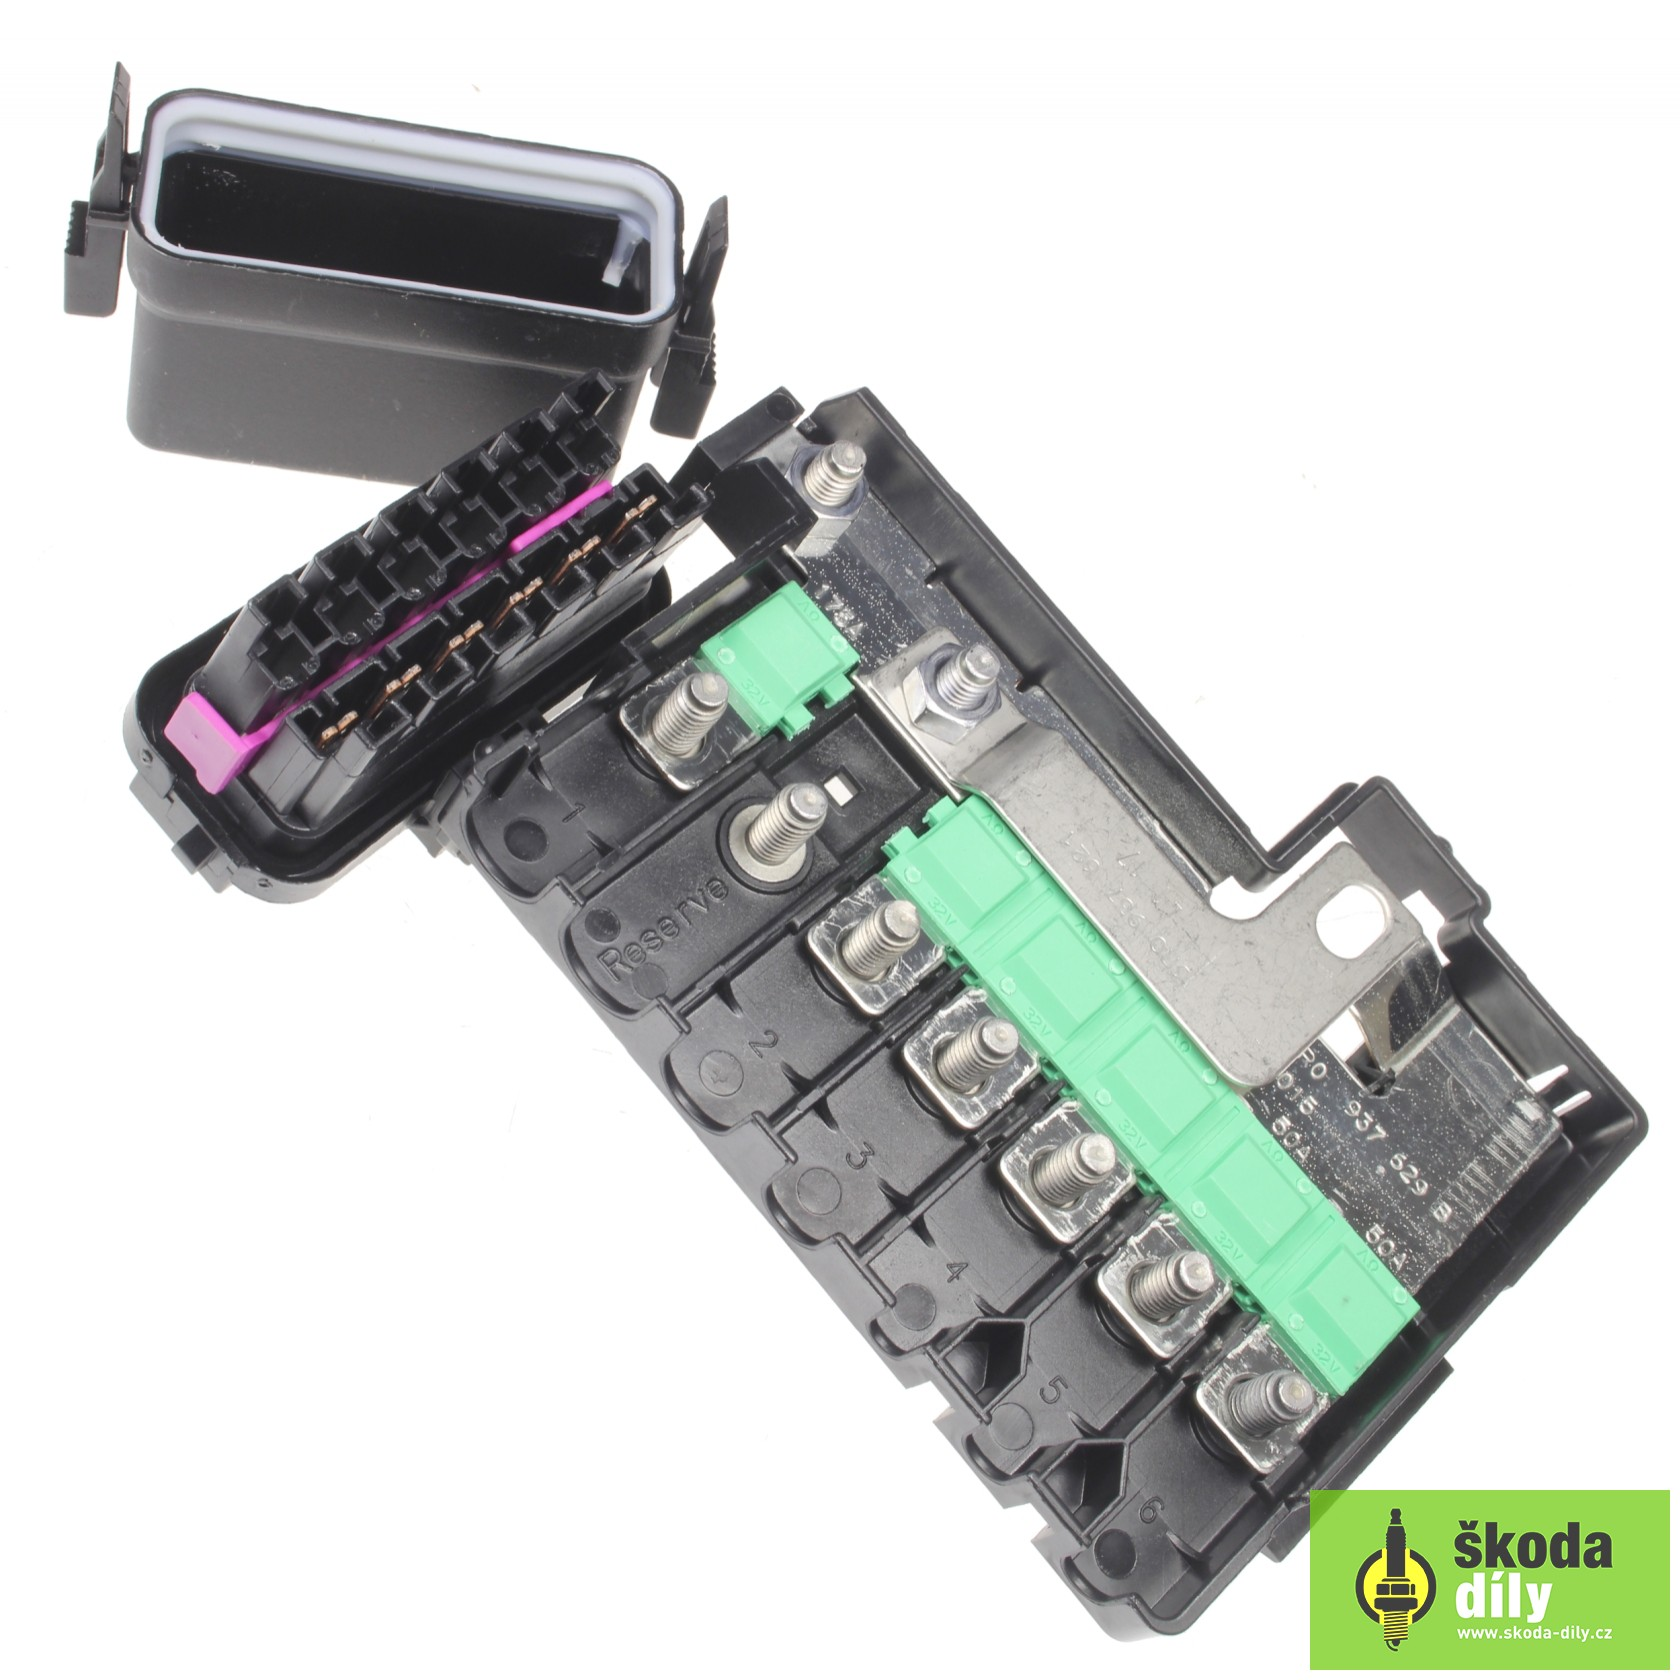 hight resolution of fuse box koda skoda parts com